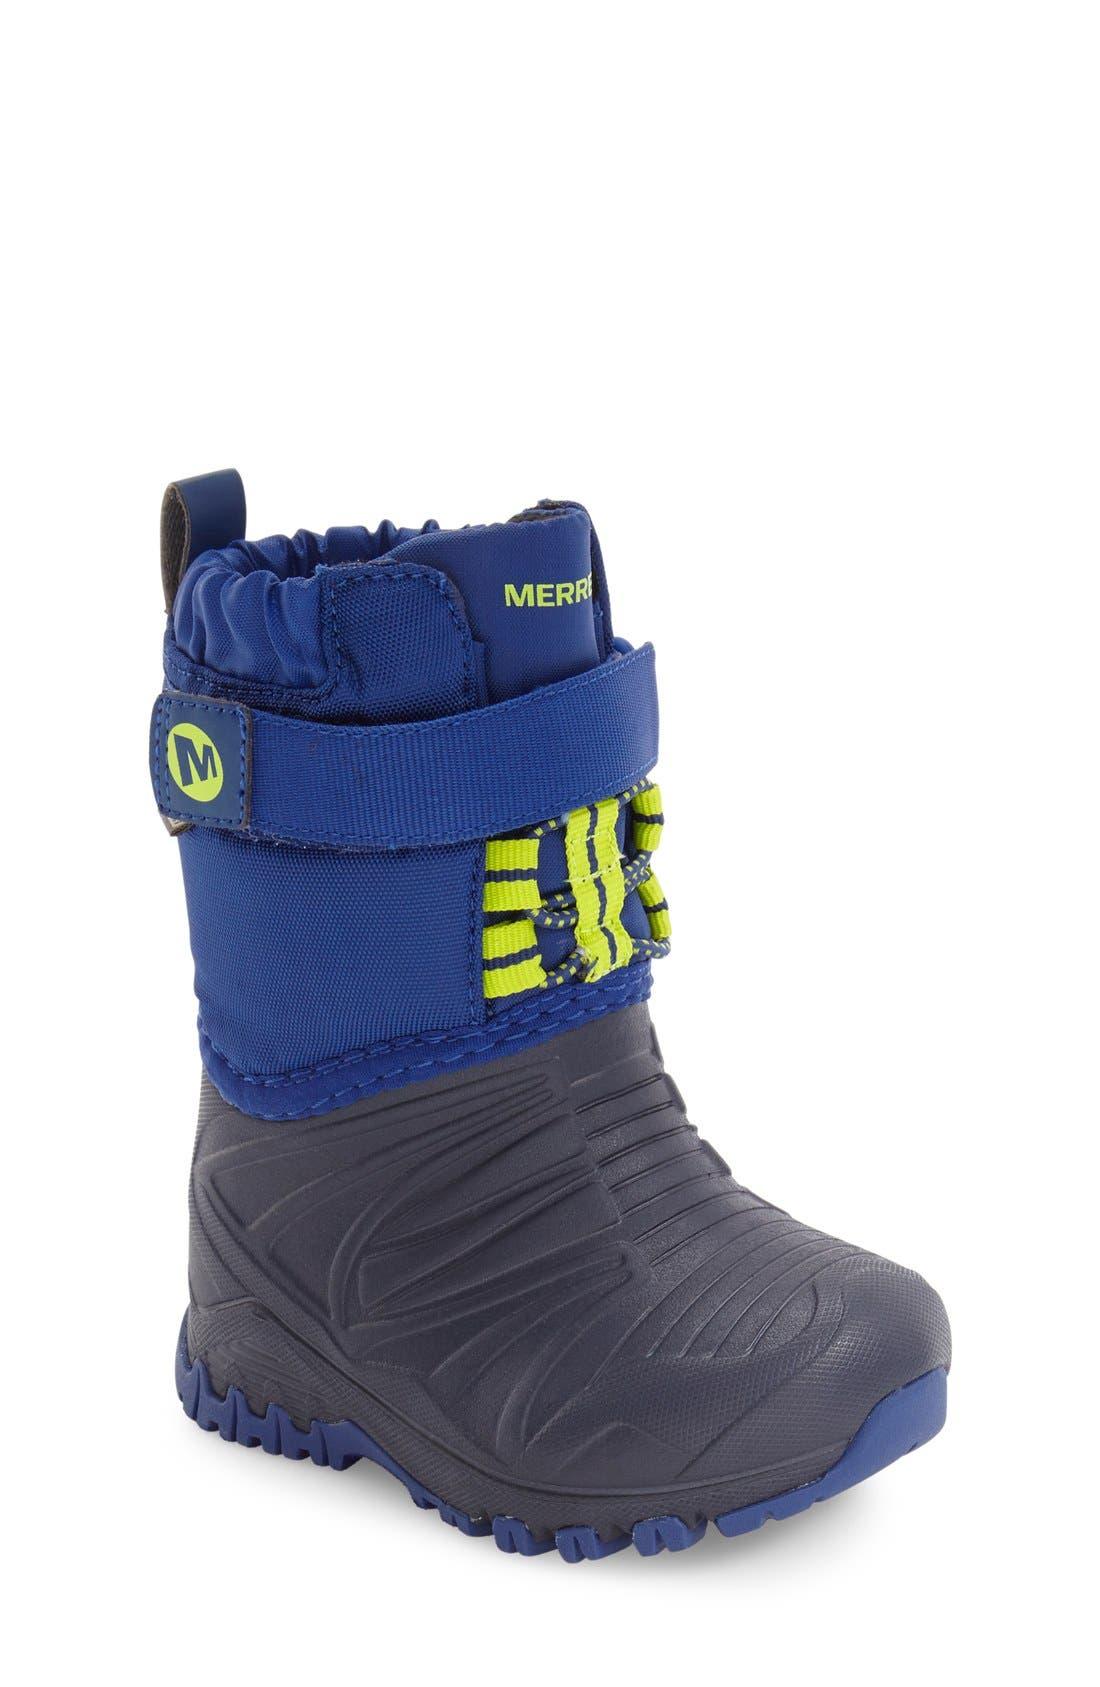 Merrell Snow Quest Lite Waterproof Snow Boot (Walker & Toddler)